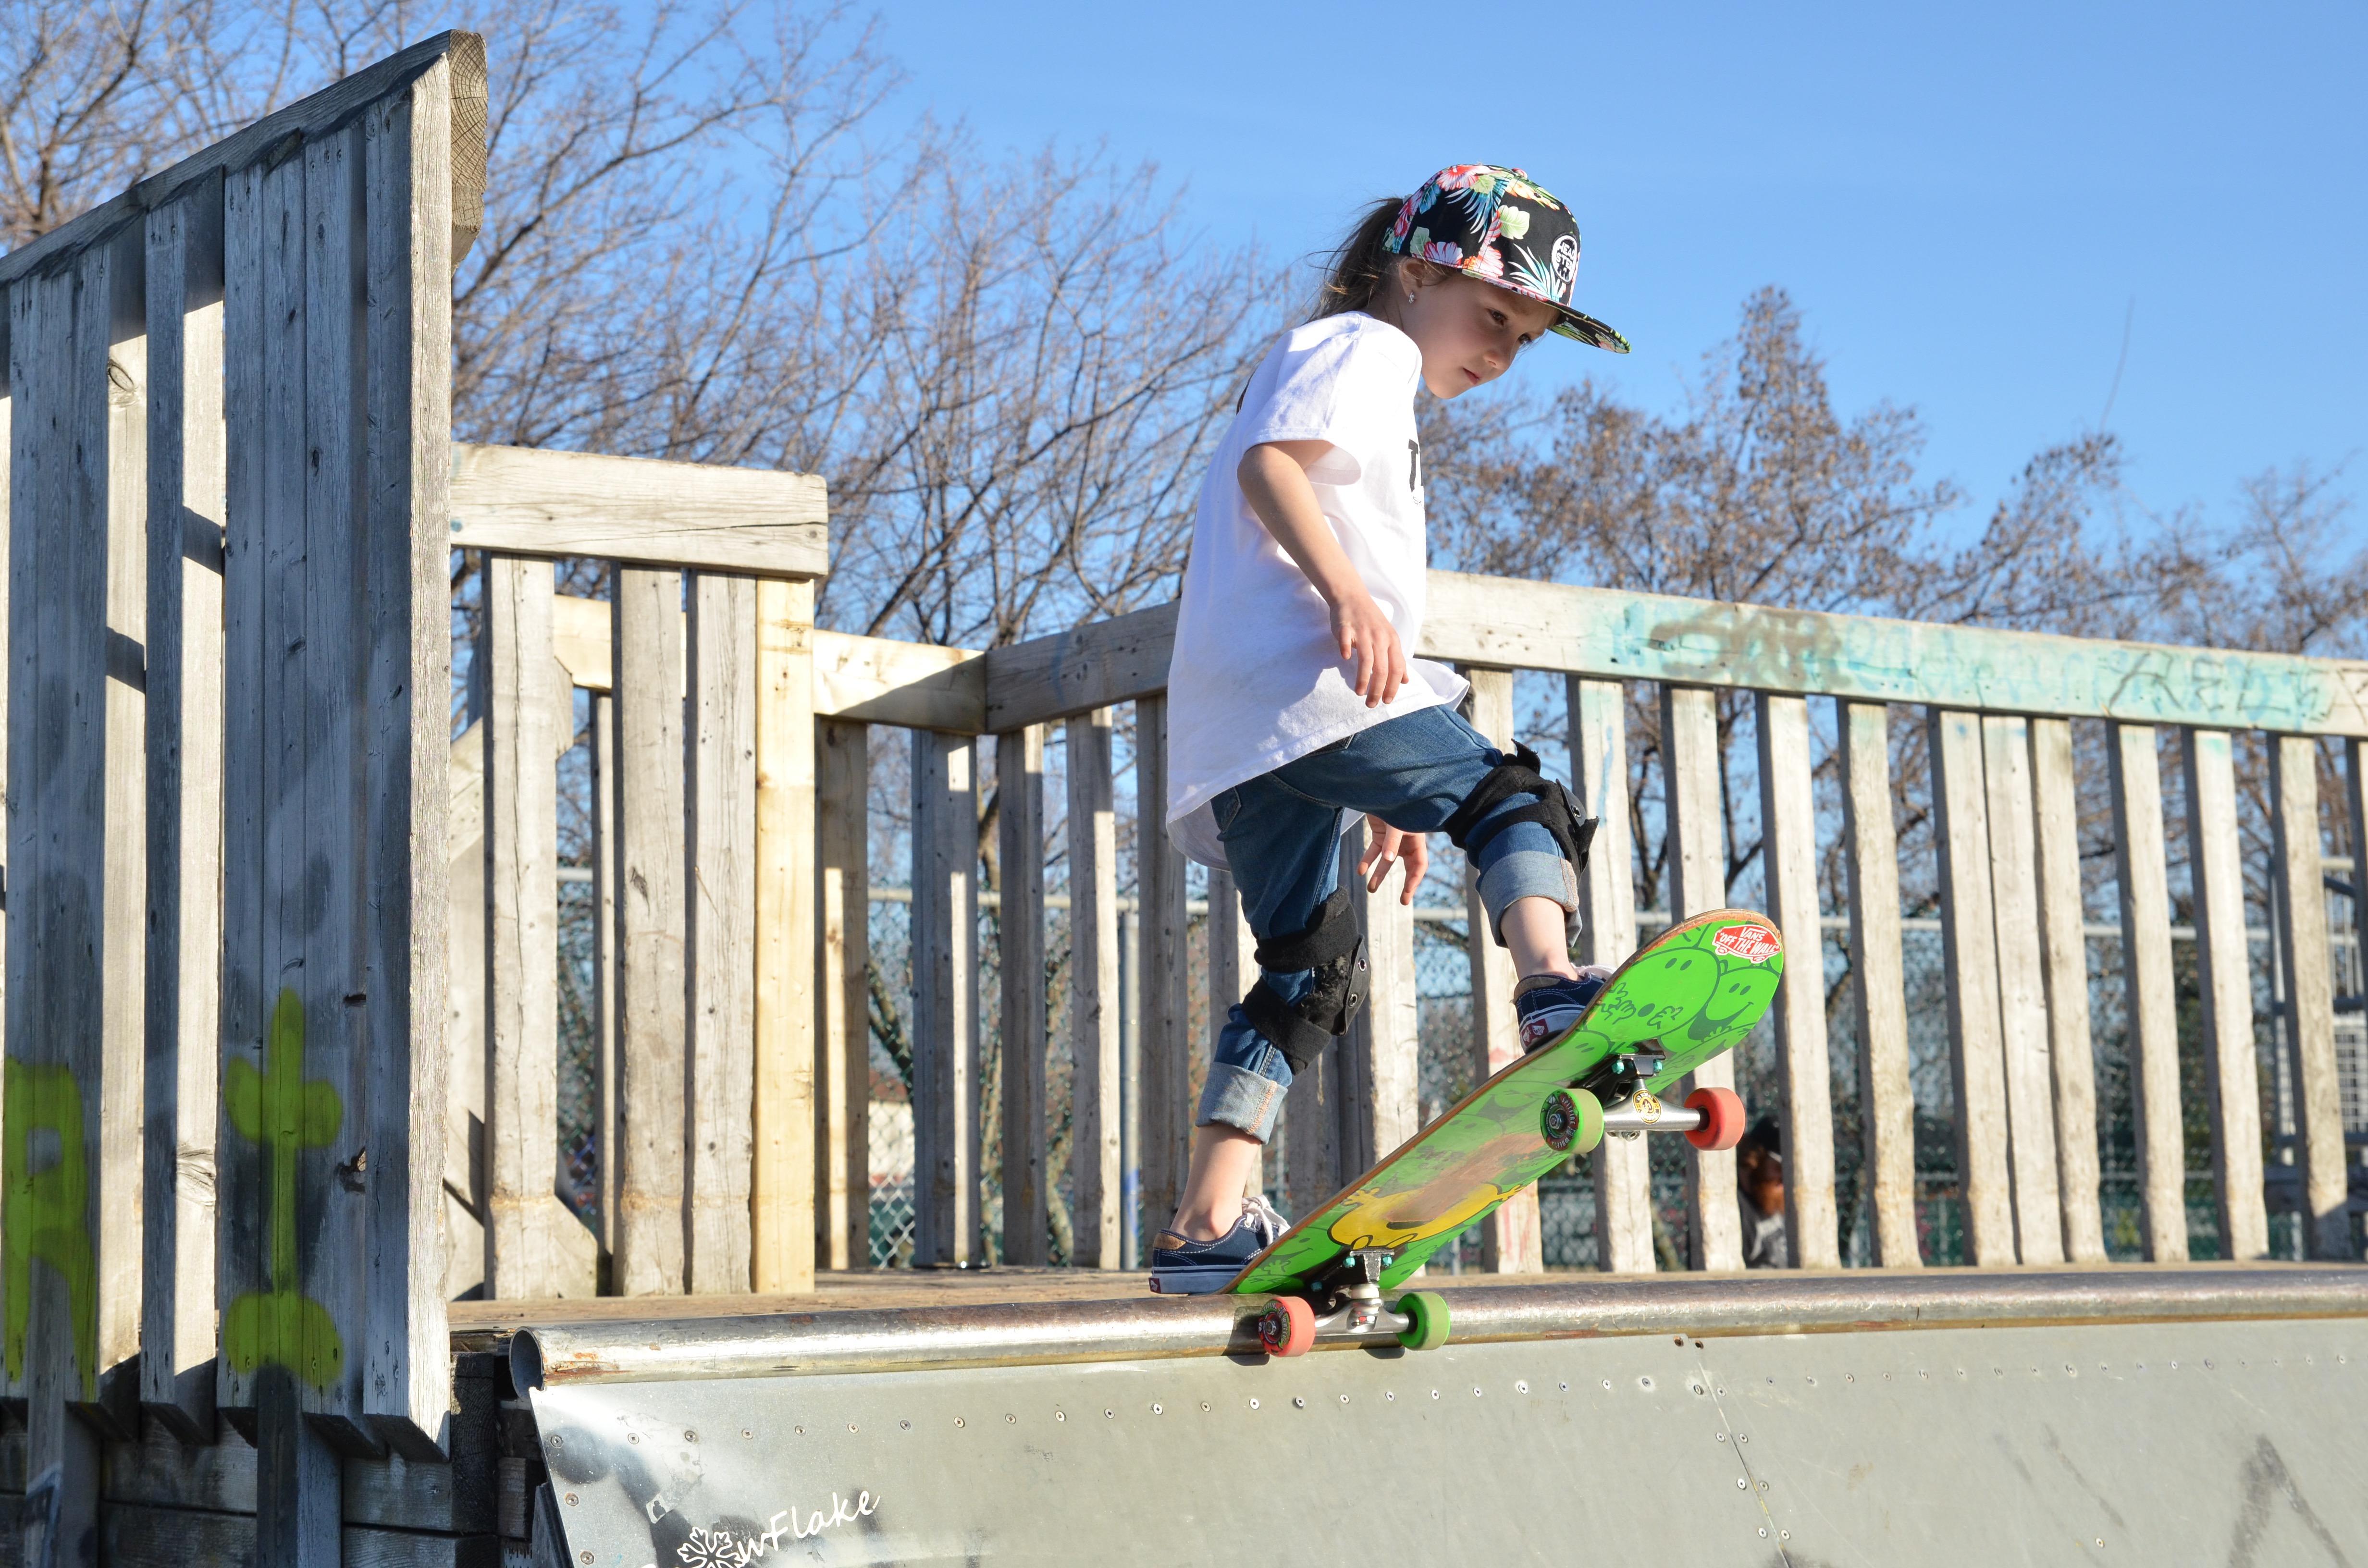 Lily-Rose, 6yr Skateboarder. Photo by Julie Goudreau